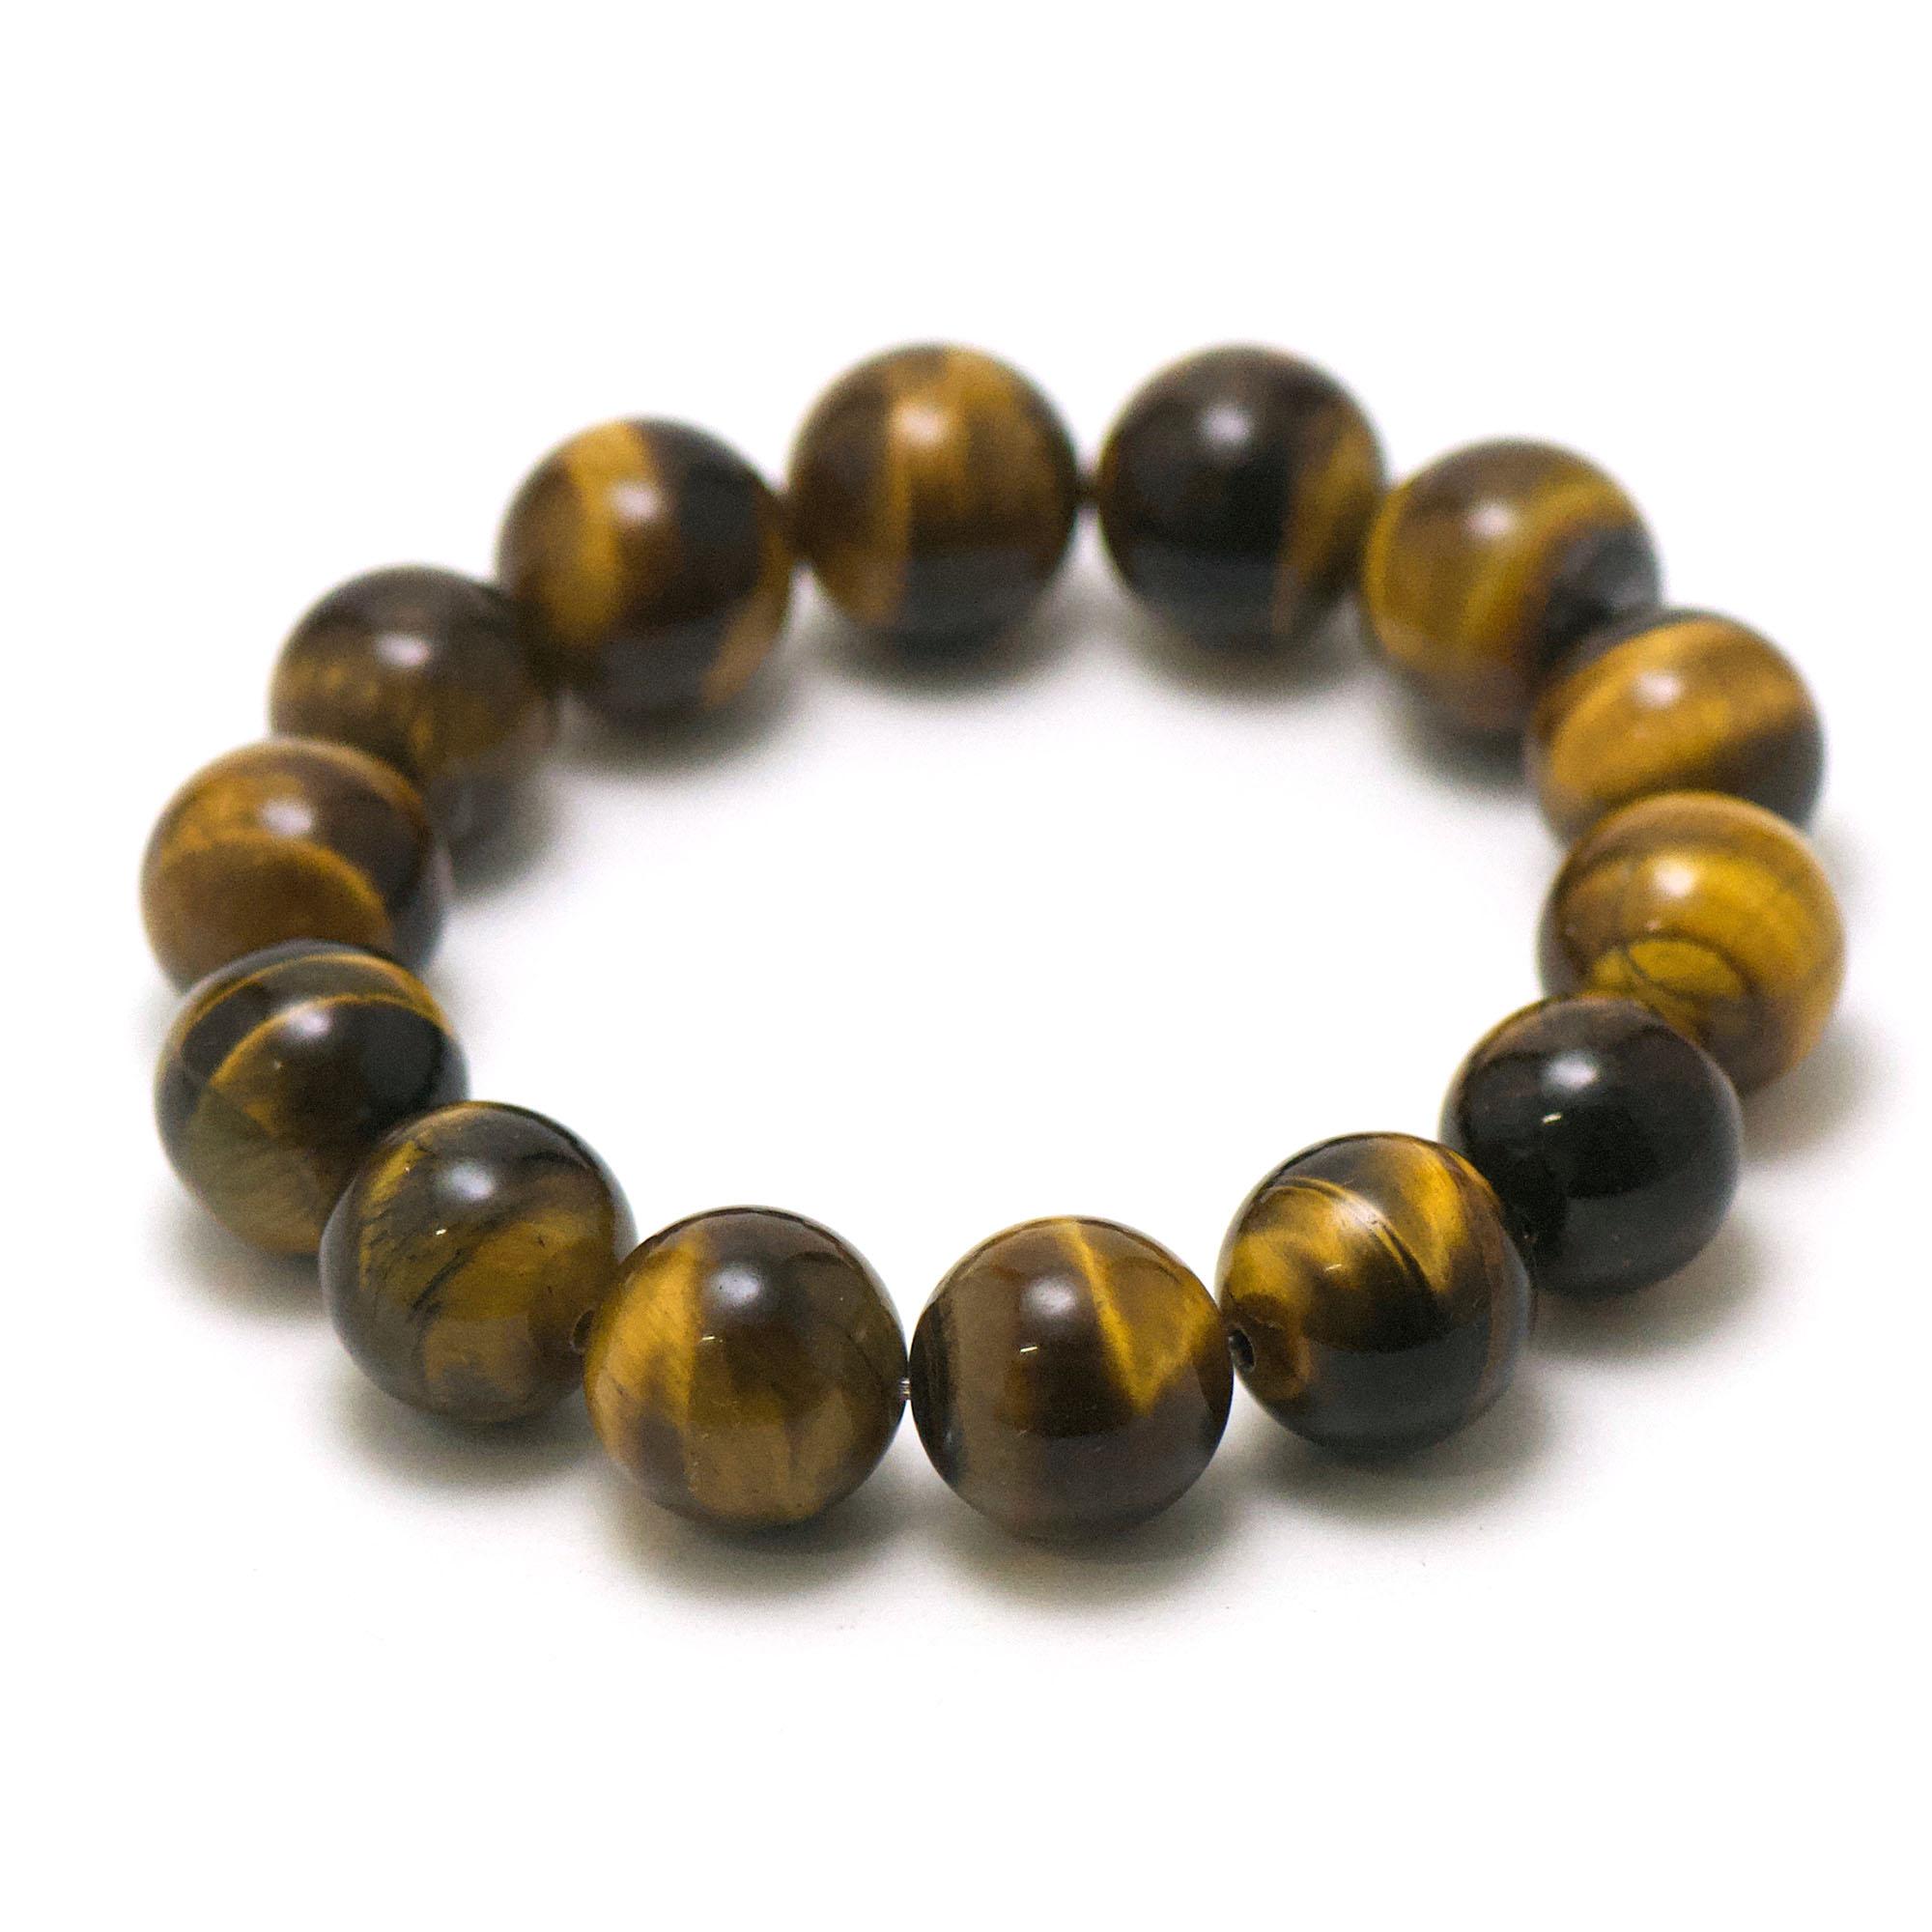 bracelet oeil de tigre perle ronde 16 mm